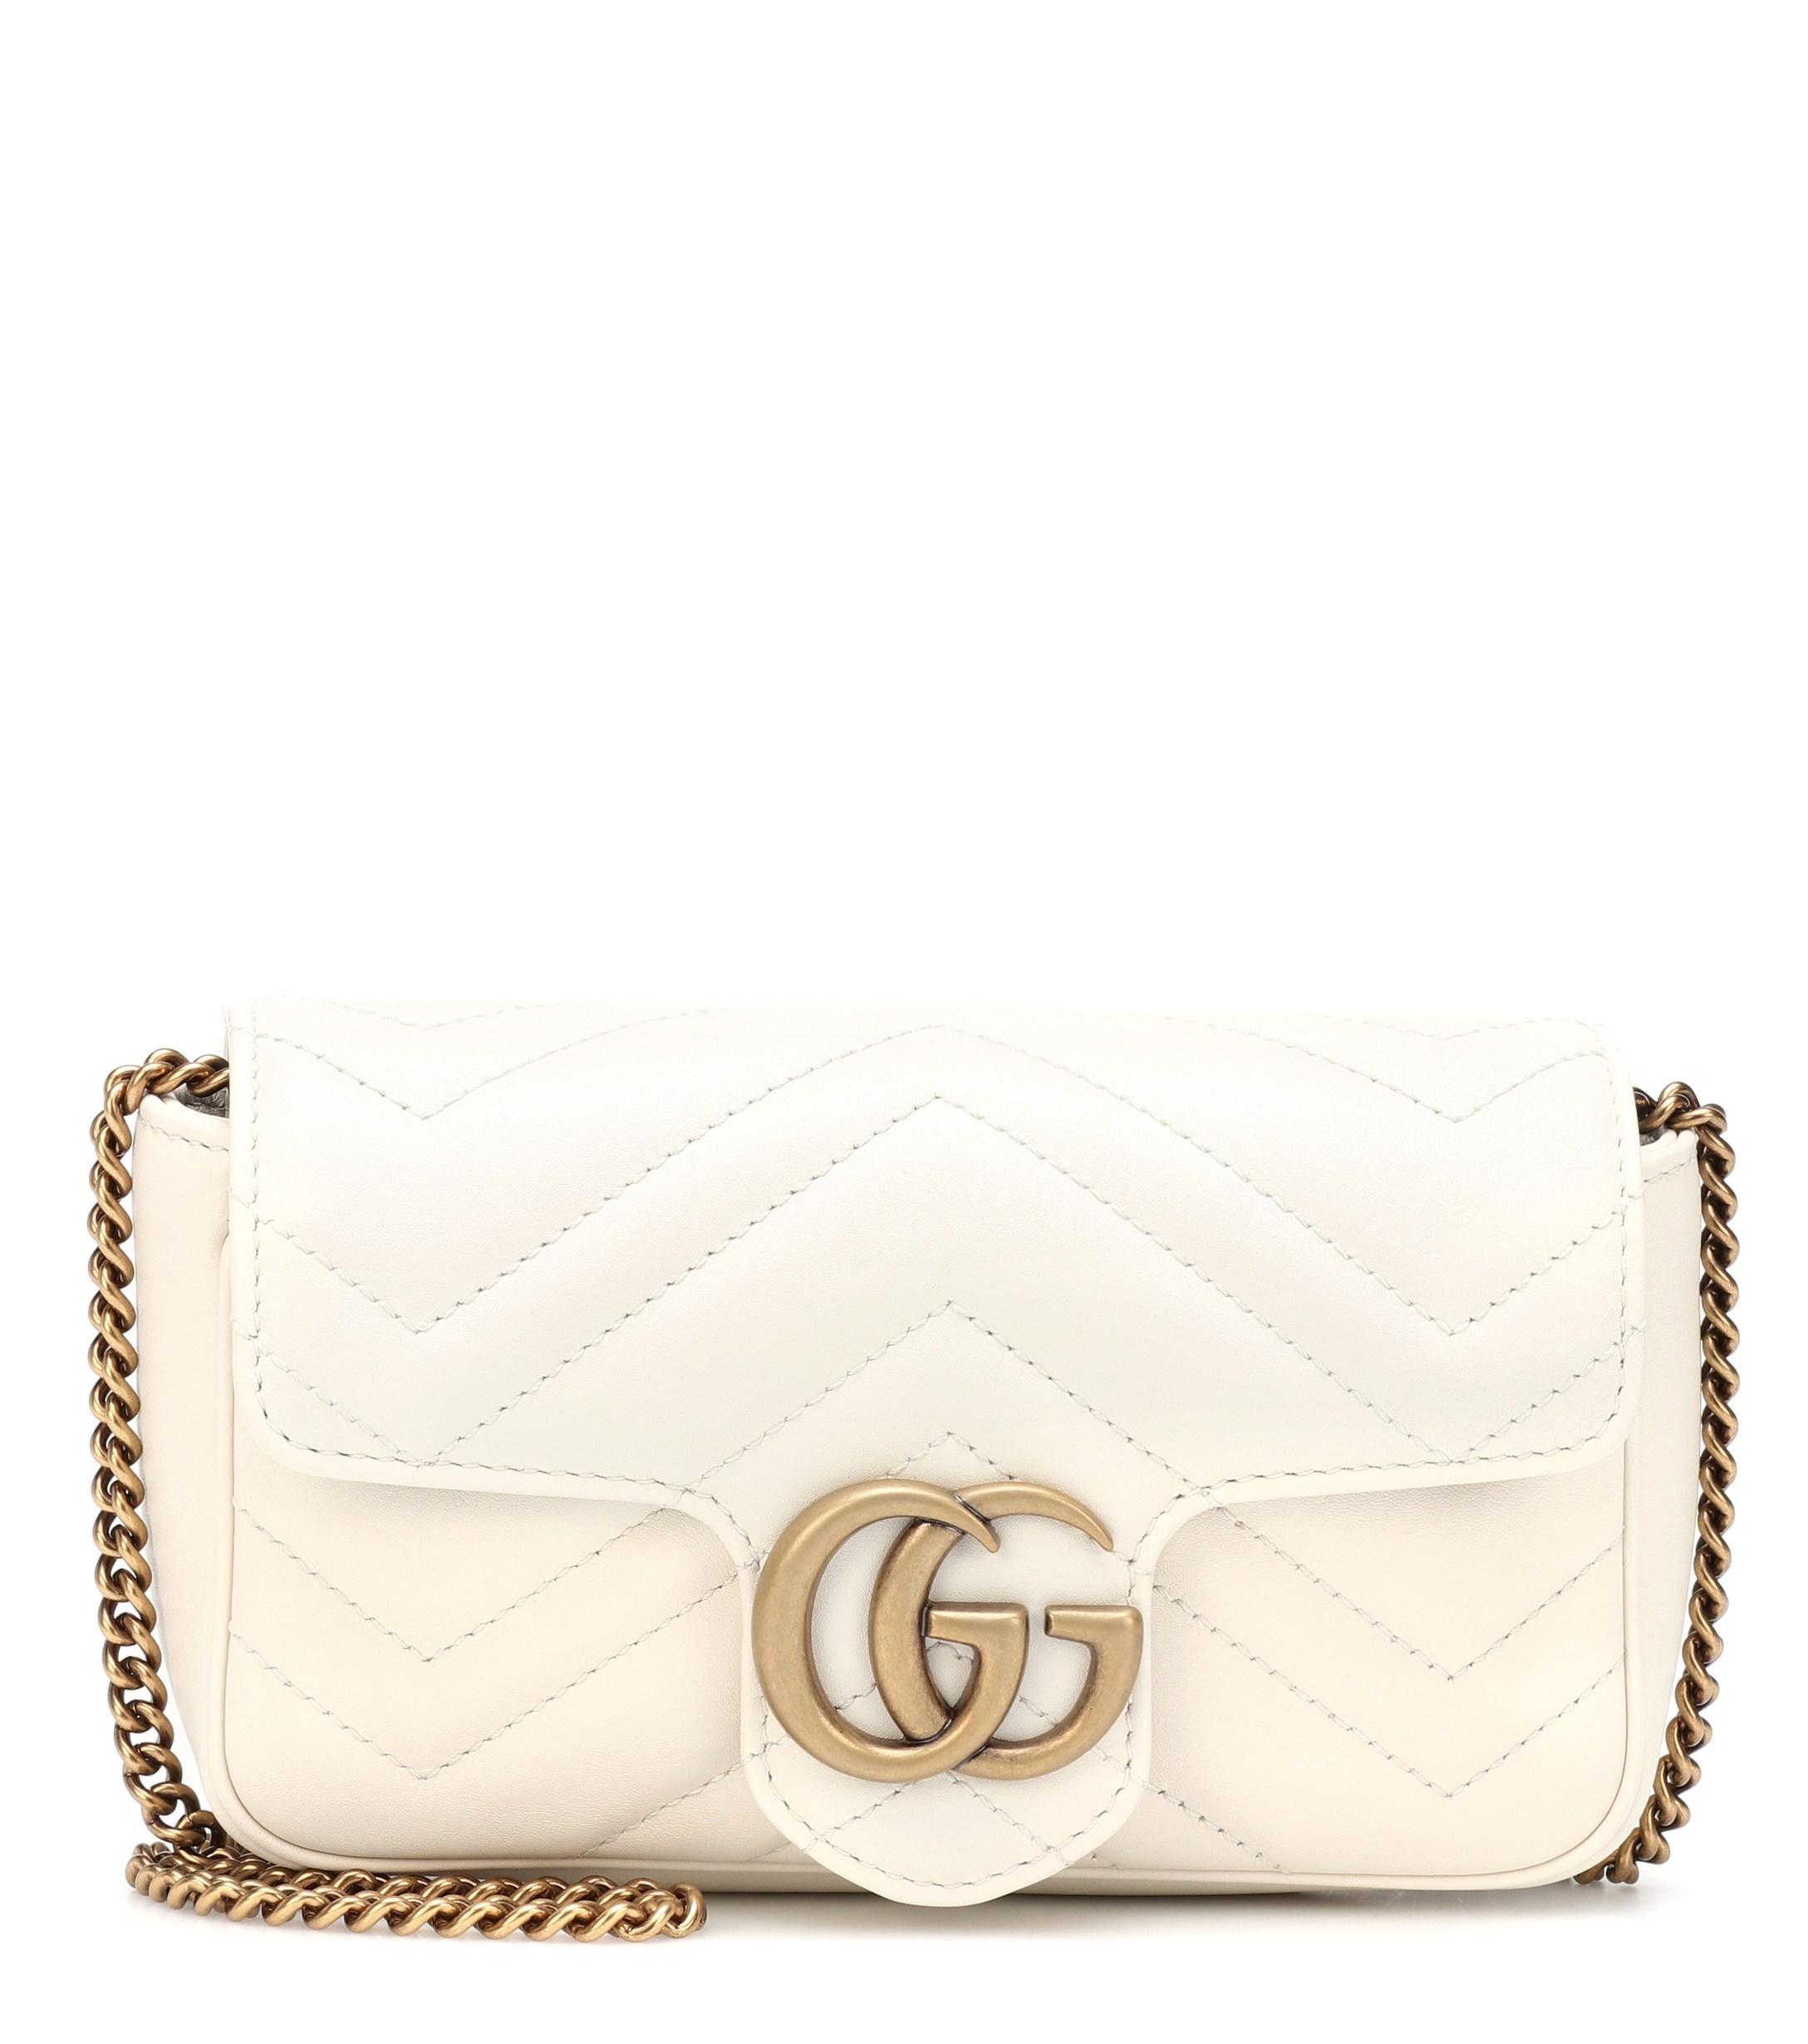 faf37bf1ec7 Gucci - White GG Marmont Super Mini Shoulder Bag - Lyst. View fullscreen